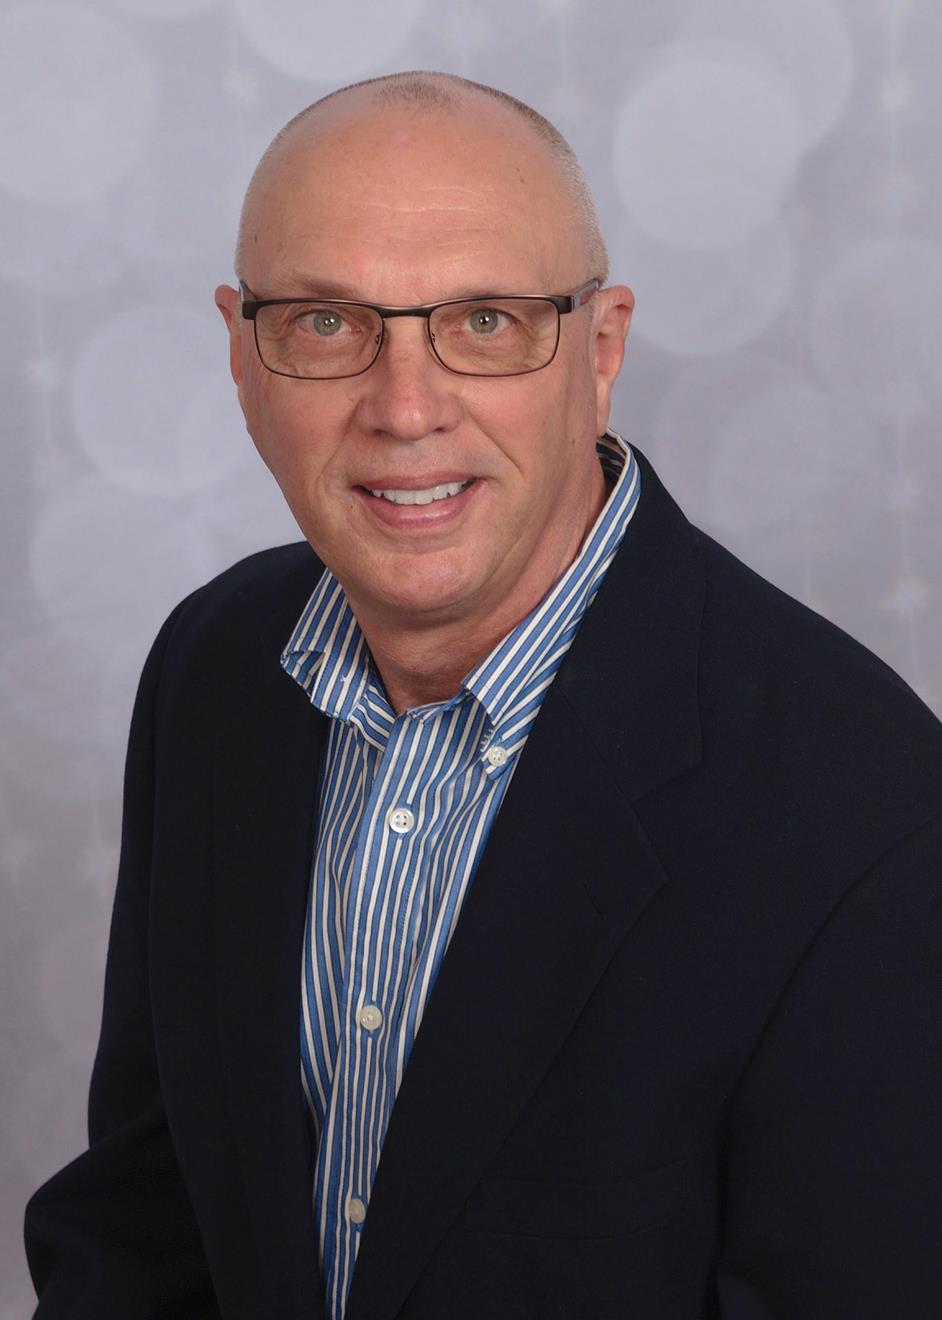 Jay L. Althouse